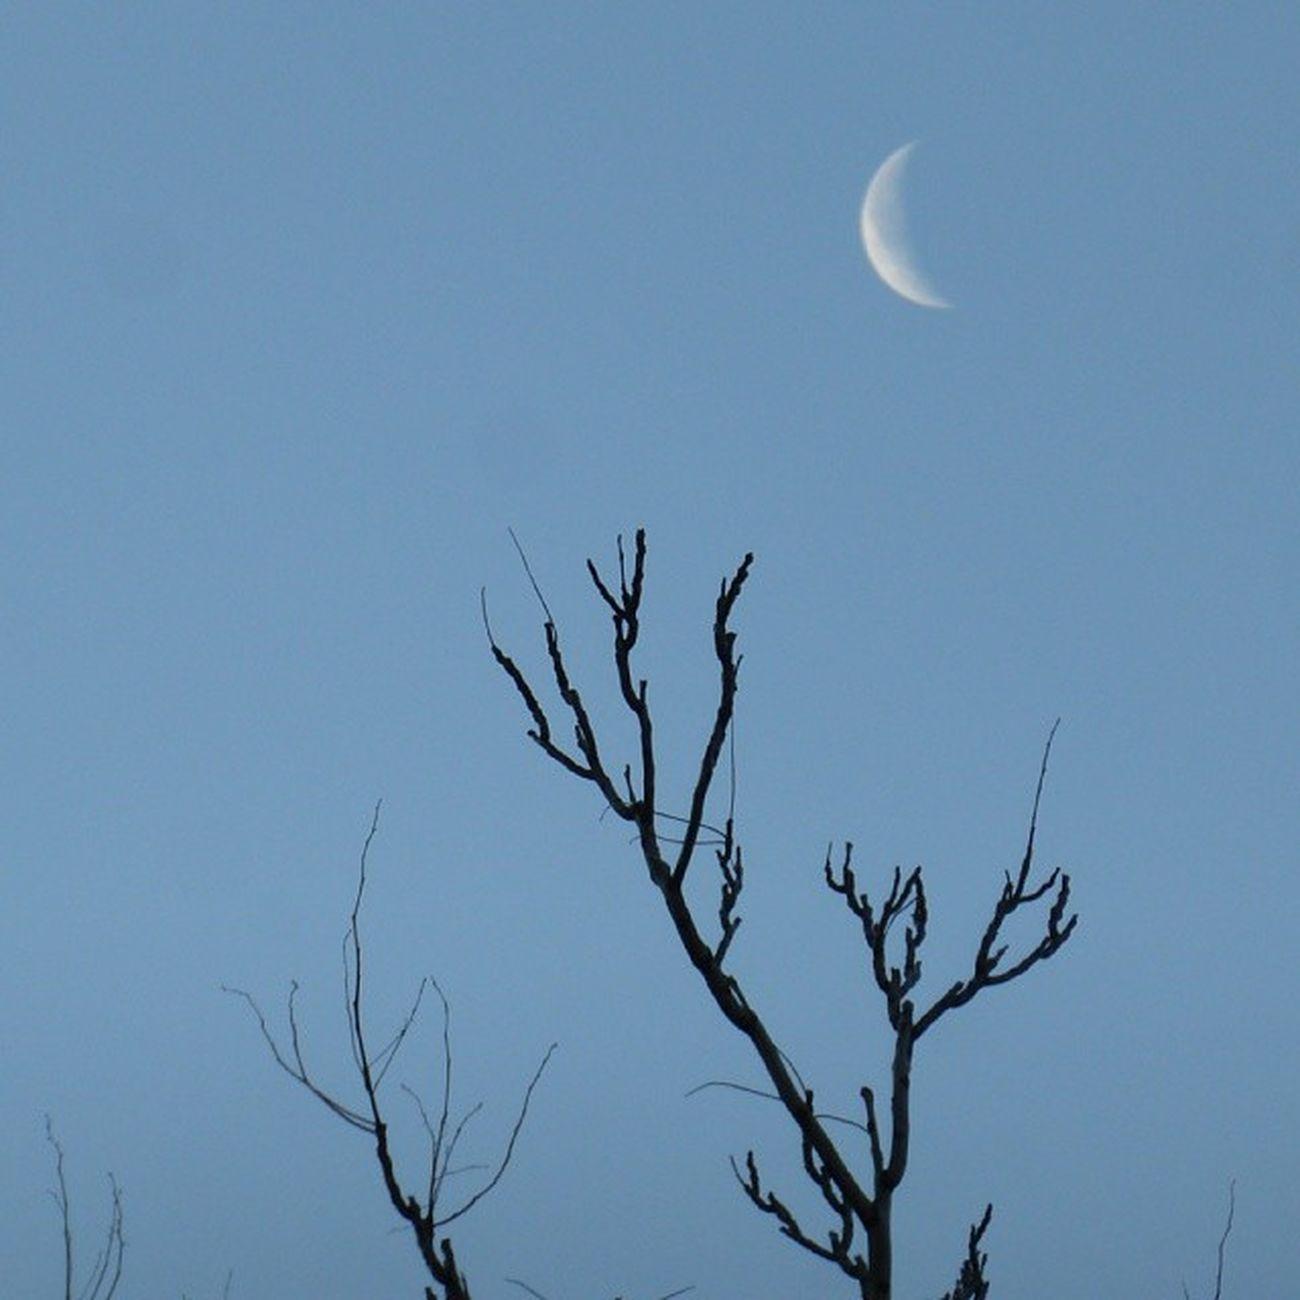 La Luna al alcance. Skylovers Zaragoza Lunalunera Igerszgz igersaragon